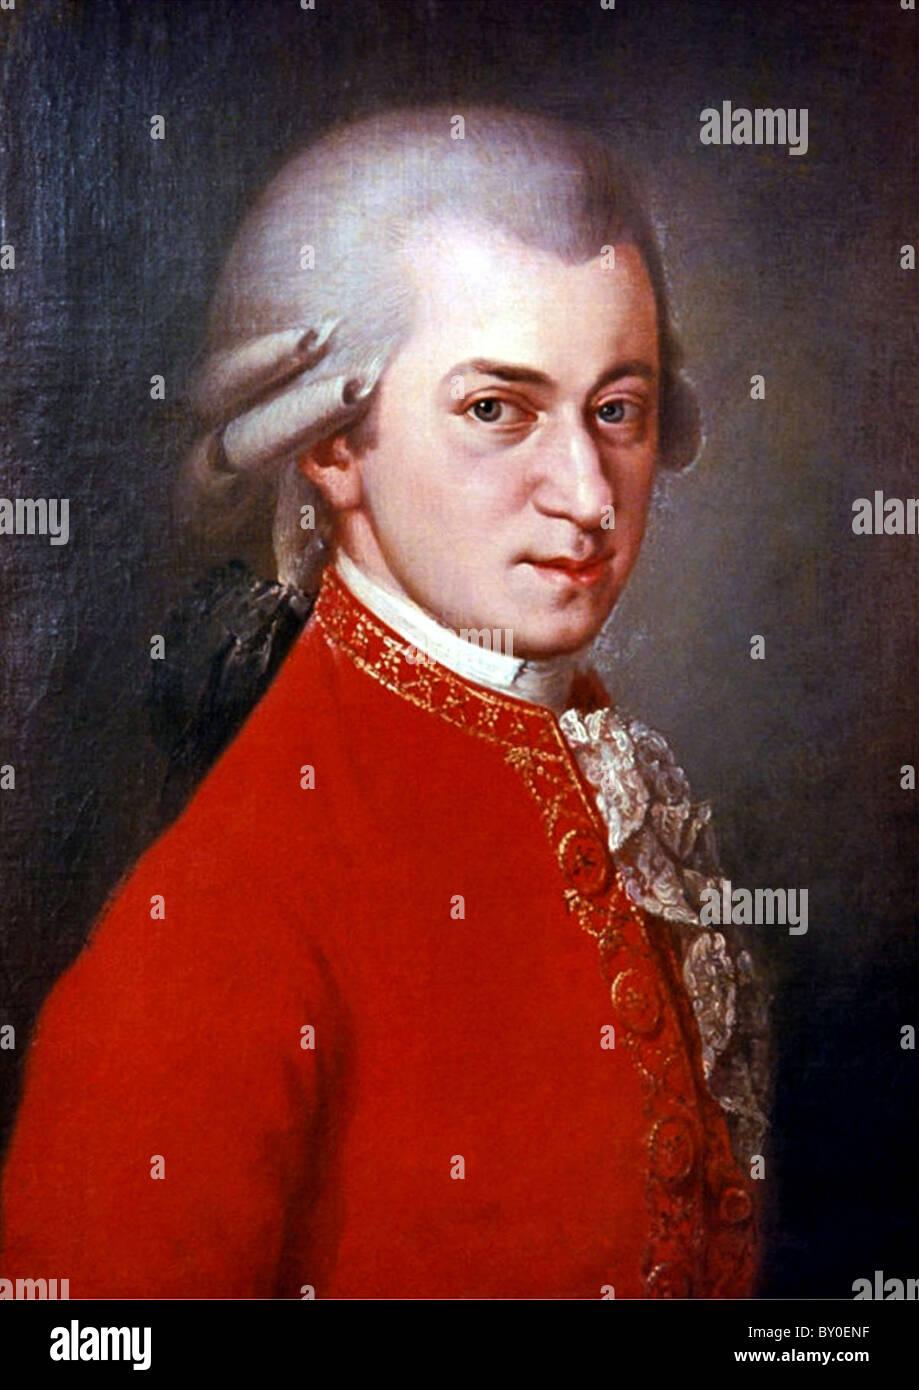 Mozart, compositore Wolfgang Amadeus Mozart Foto Stock